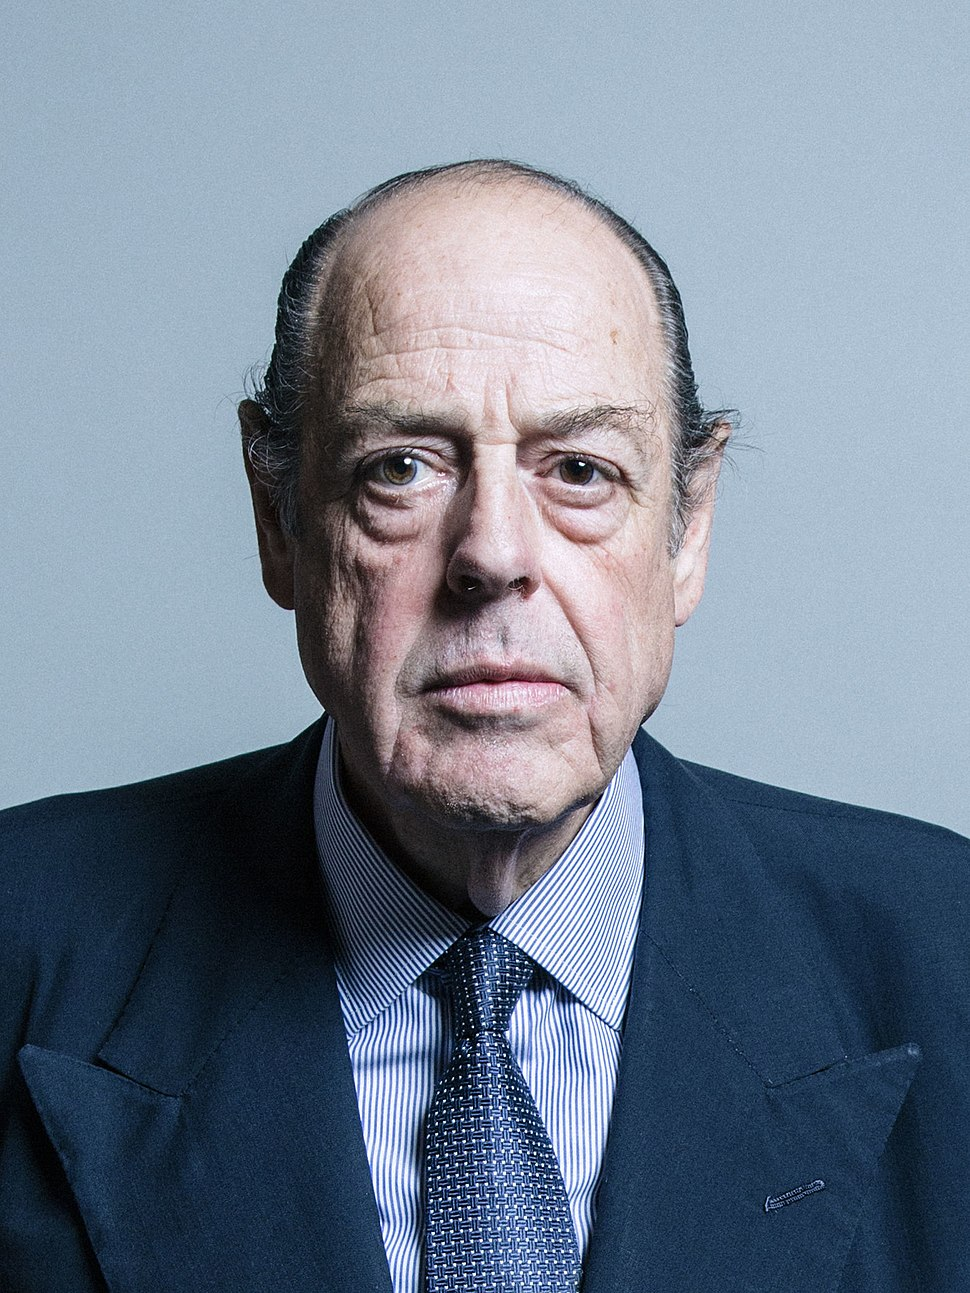 Official portrait of Sir Nicholas Soames crop 2